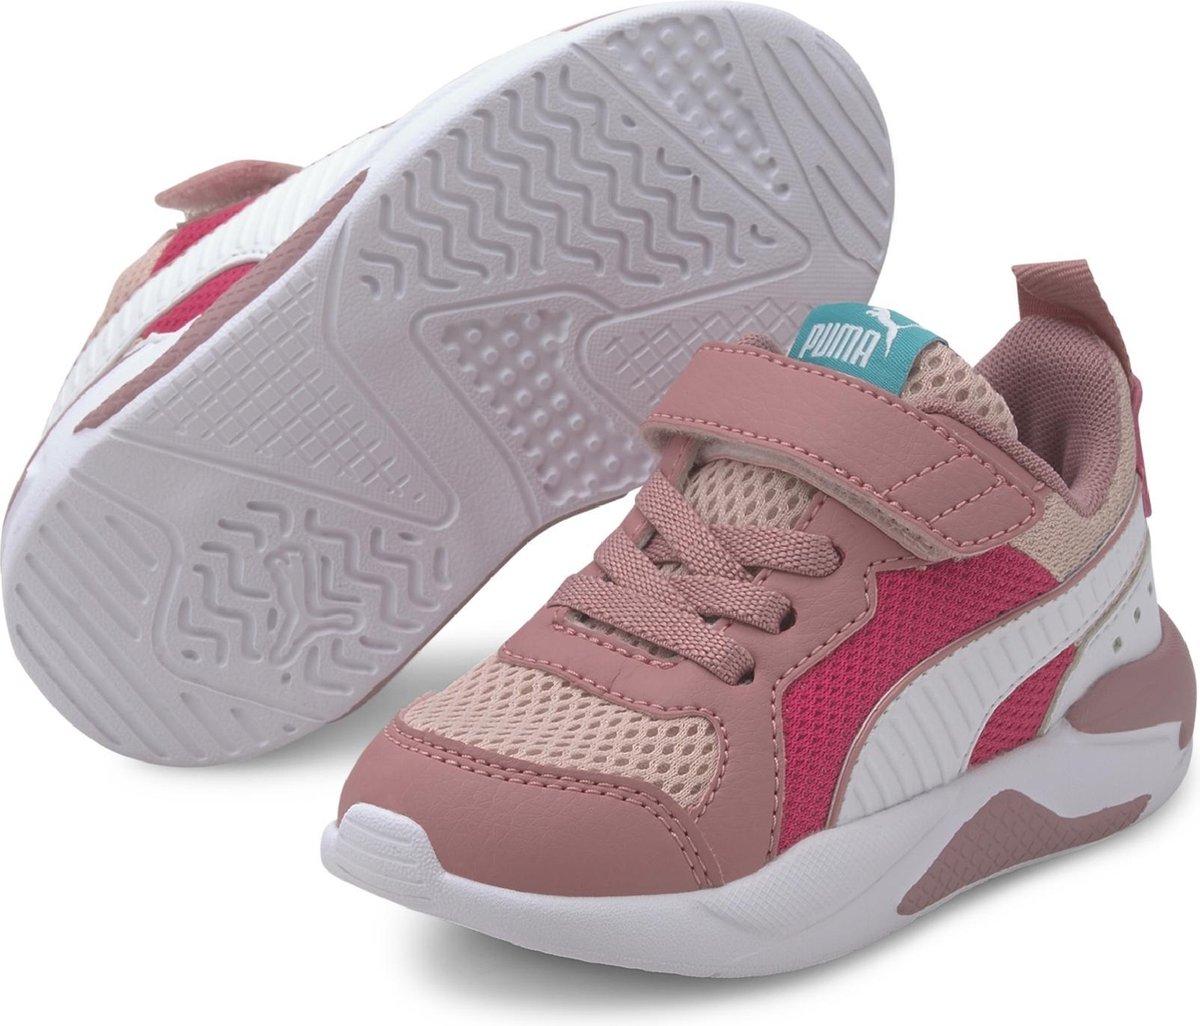 PUMA X-Ray AC Inf Sneakers Unisex - Peachskin-Puma White-Foxglove-Glowing Pink-Viridian Green - Maat 23